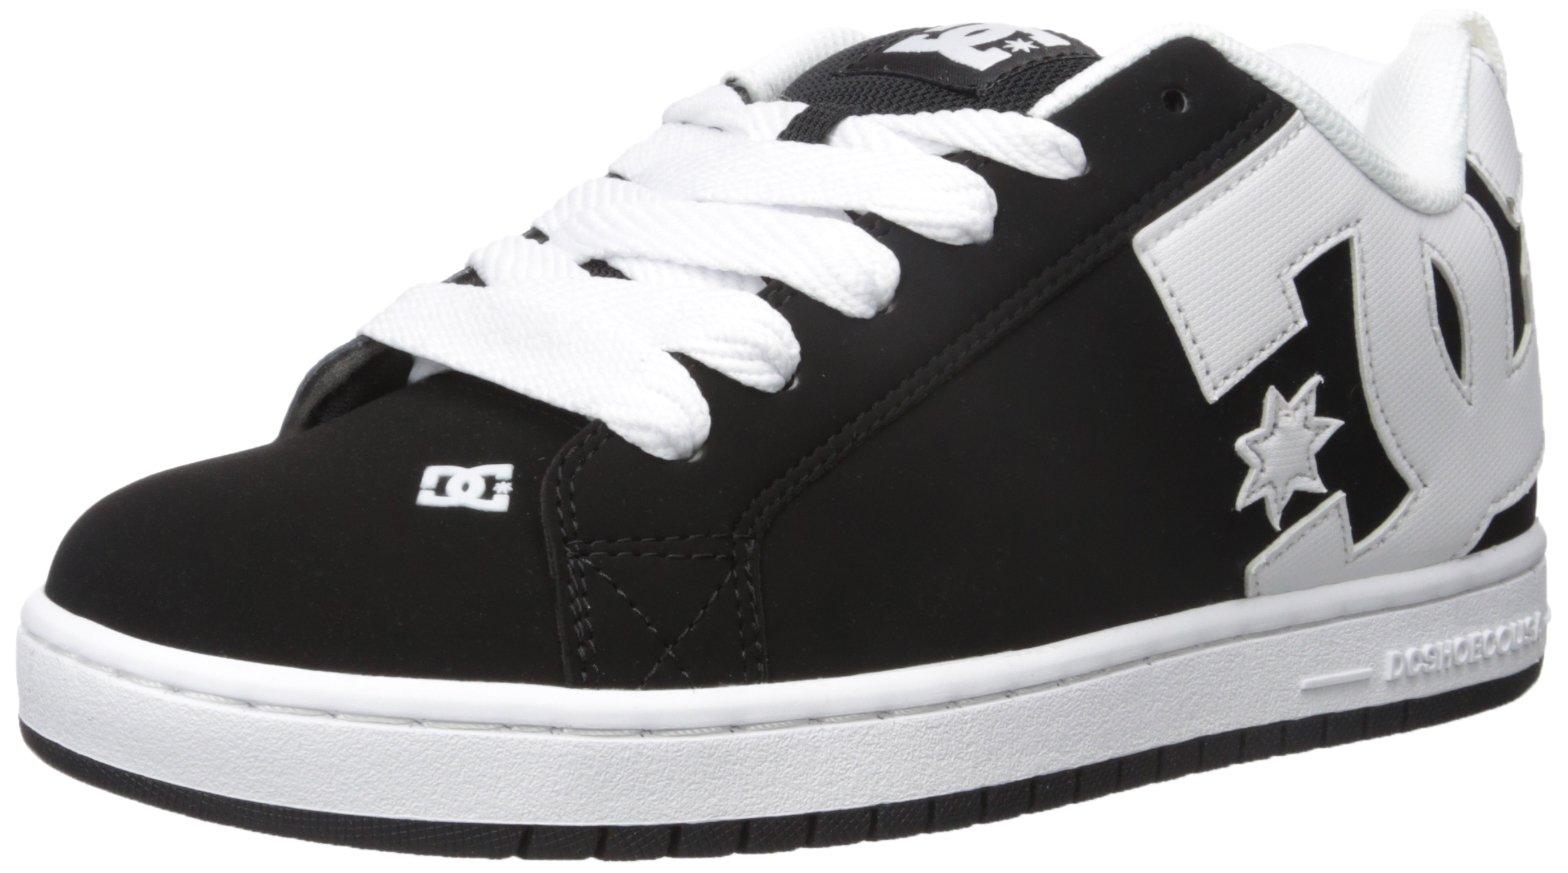 DC Men's Court Graffik Skate Shoe, Black/White/Black, 18 M US